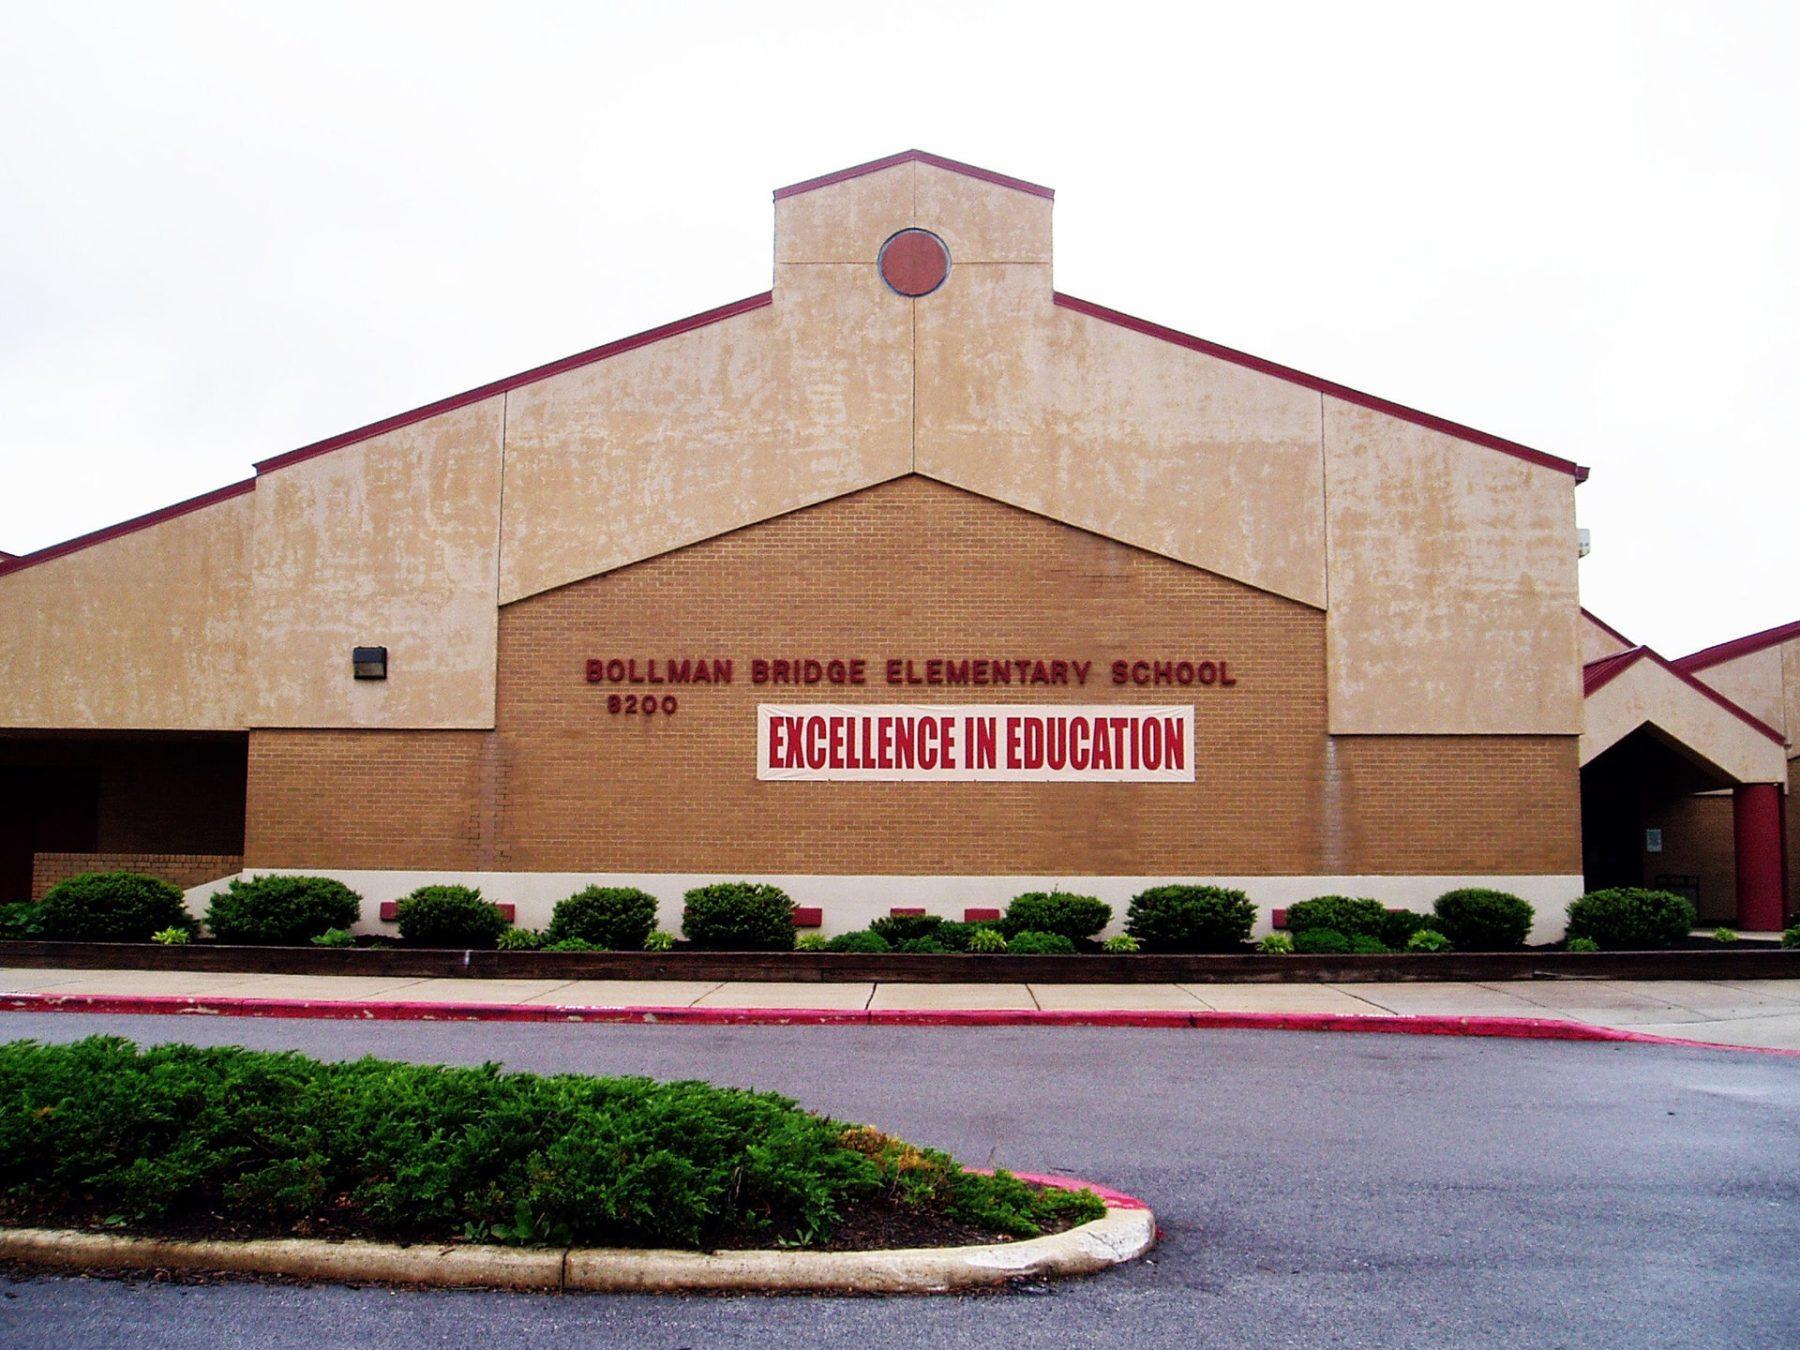 Howard County Public Schools – Bollman Bridge Elementary School